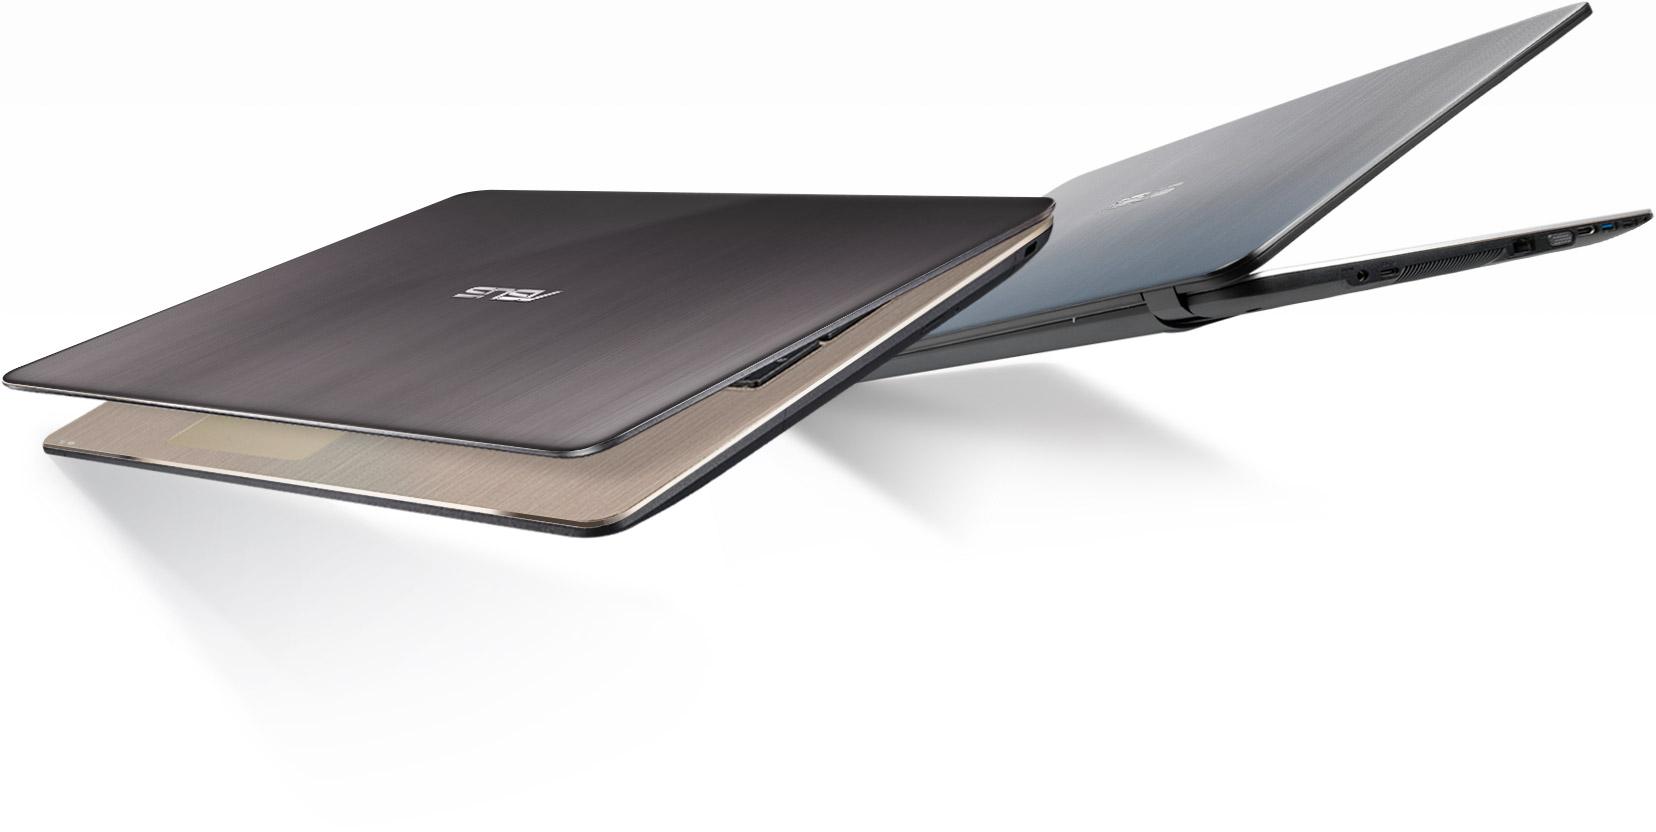 X540sc Laptops Asus Global